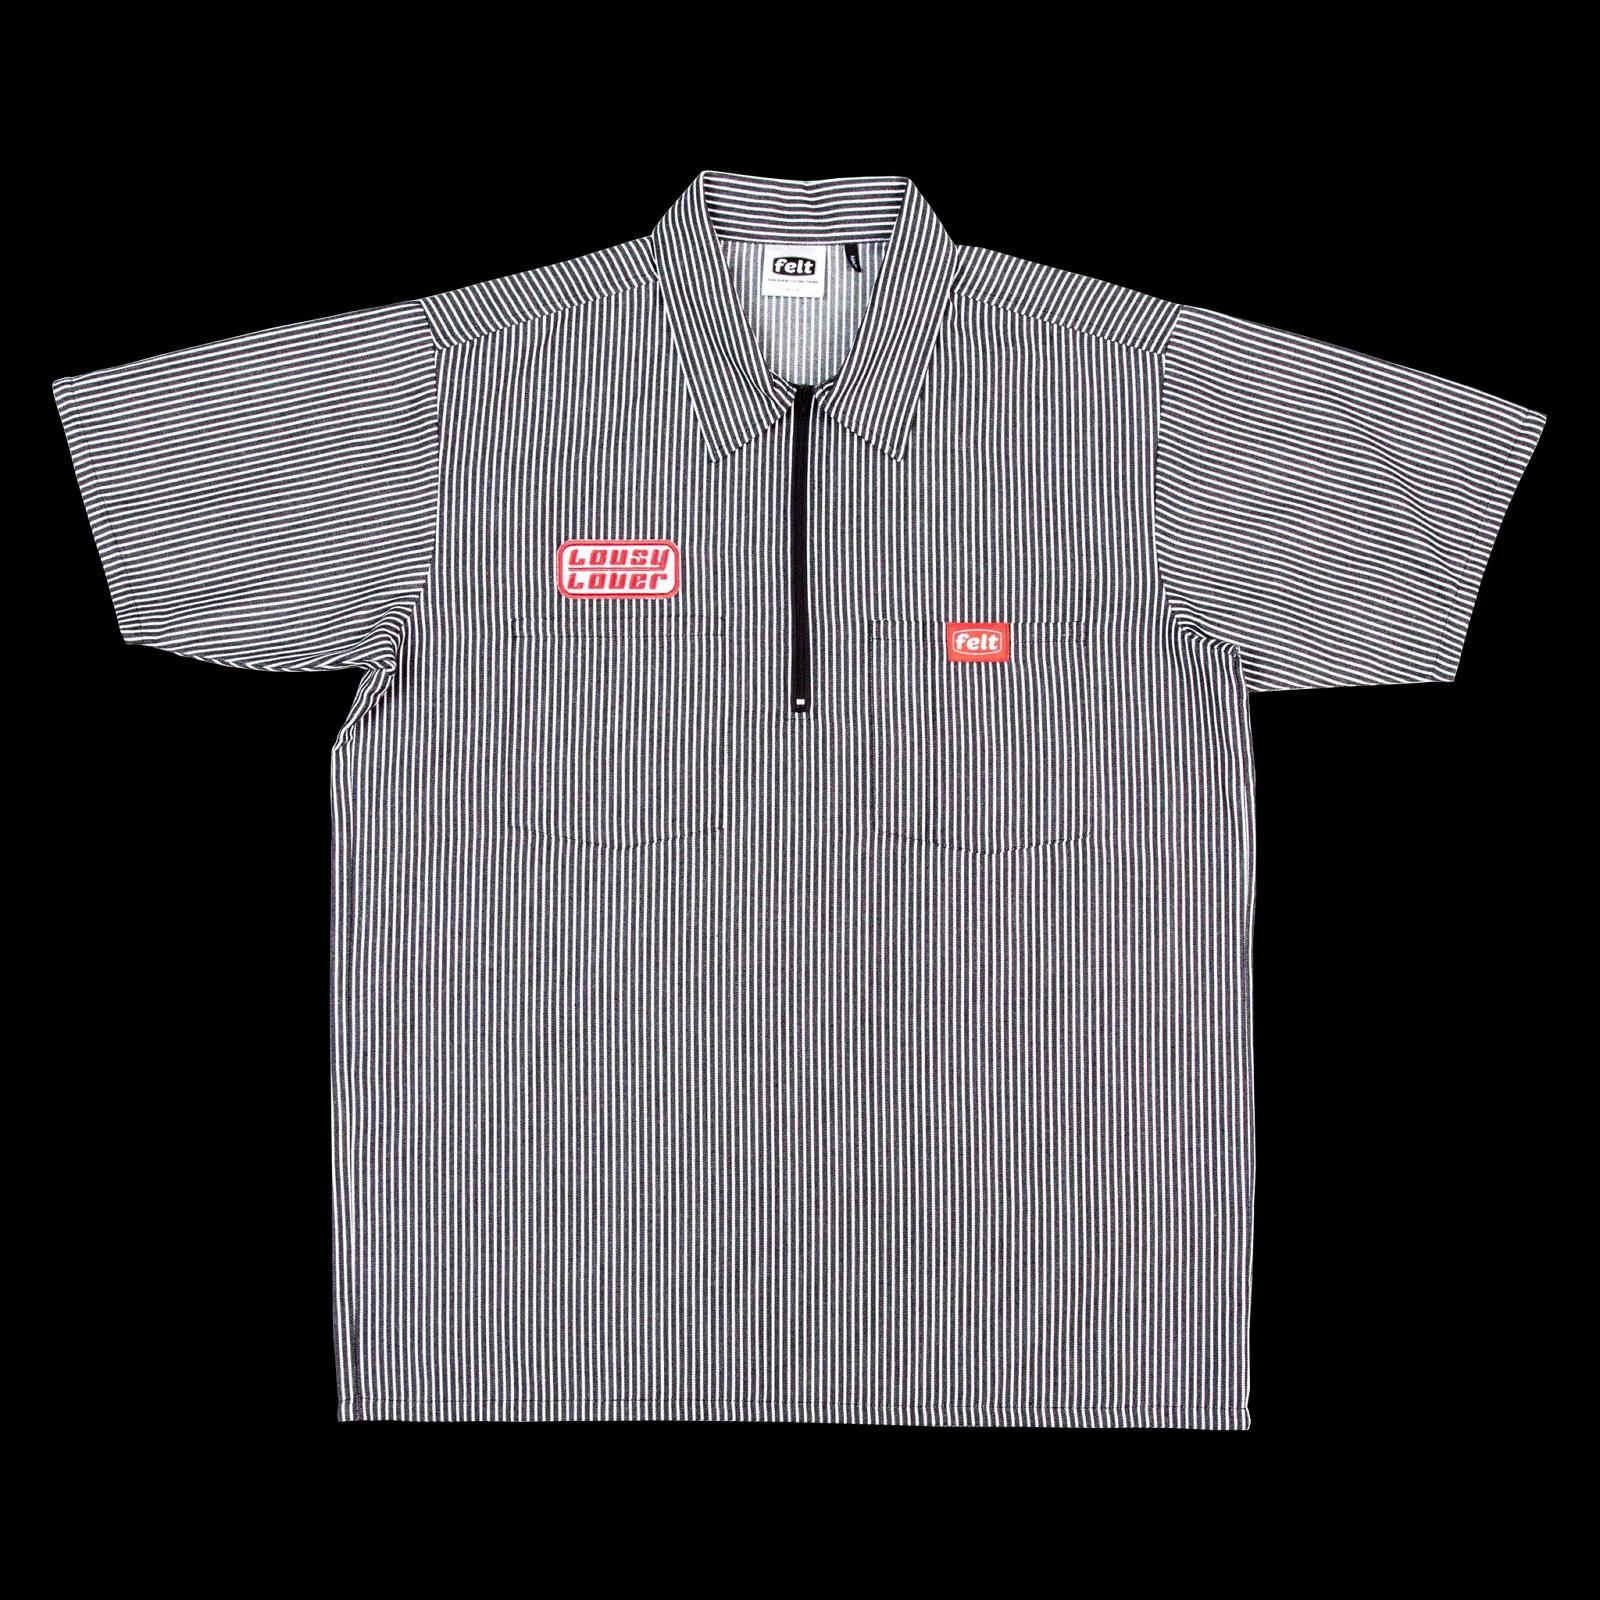 【FELT/フェルト】SCULPTOR QUARTER ZIP WORK SHIRT ワークシャツ / BLACK